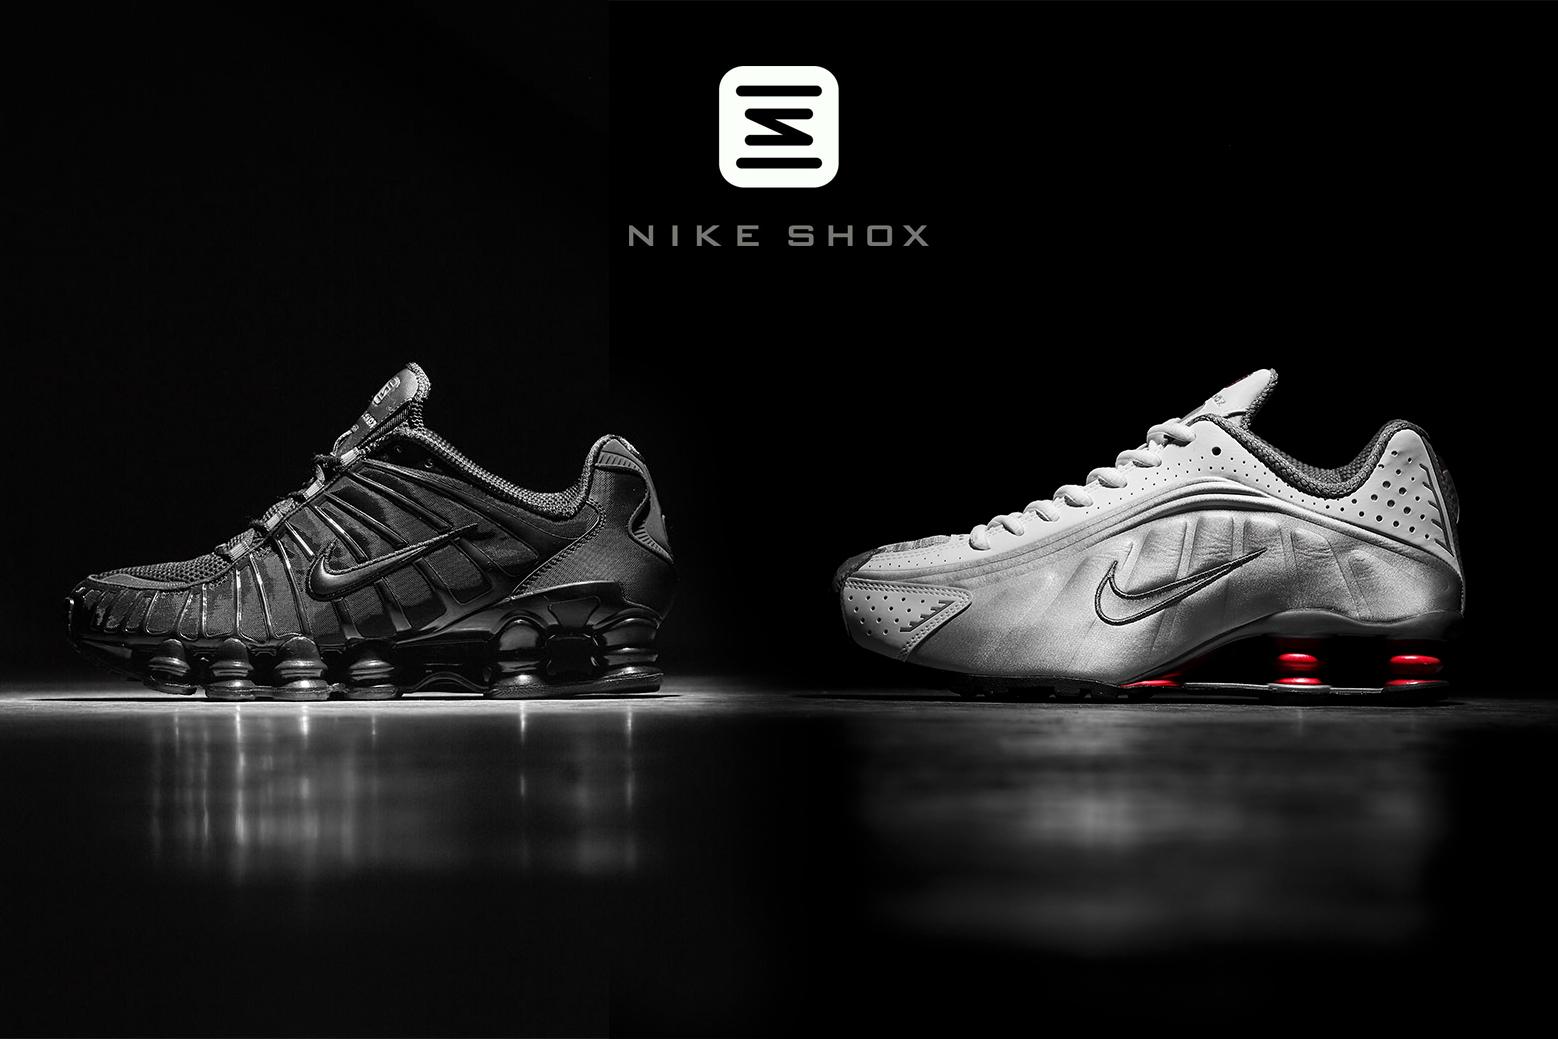 separation shoes 47da4 02e62 Nike Shox R4 & TL - size? blog